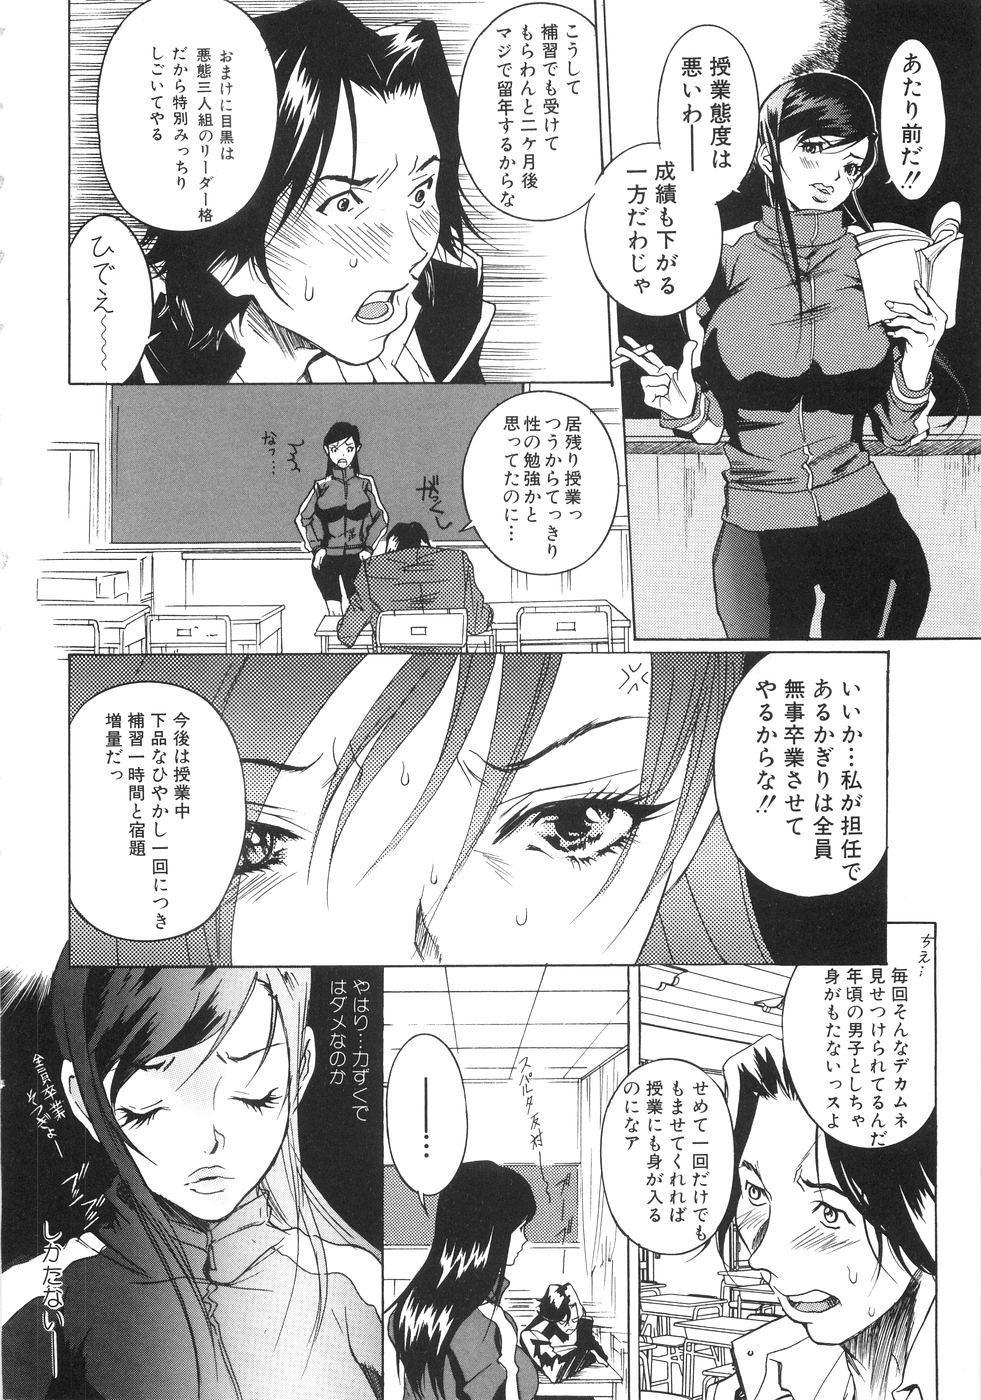 Honki Jiru - Cowper's Gland Liquid? or Love Juice?...?! 8